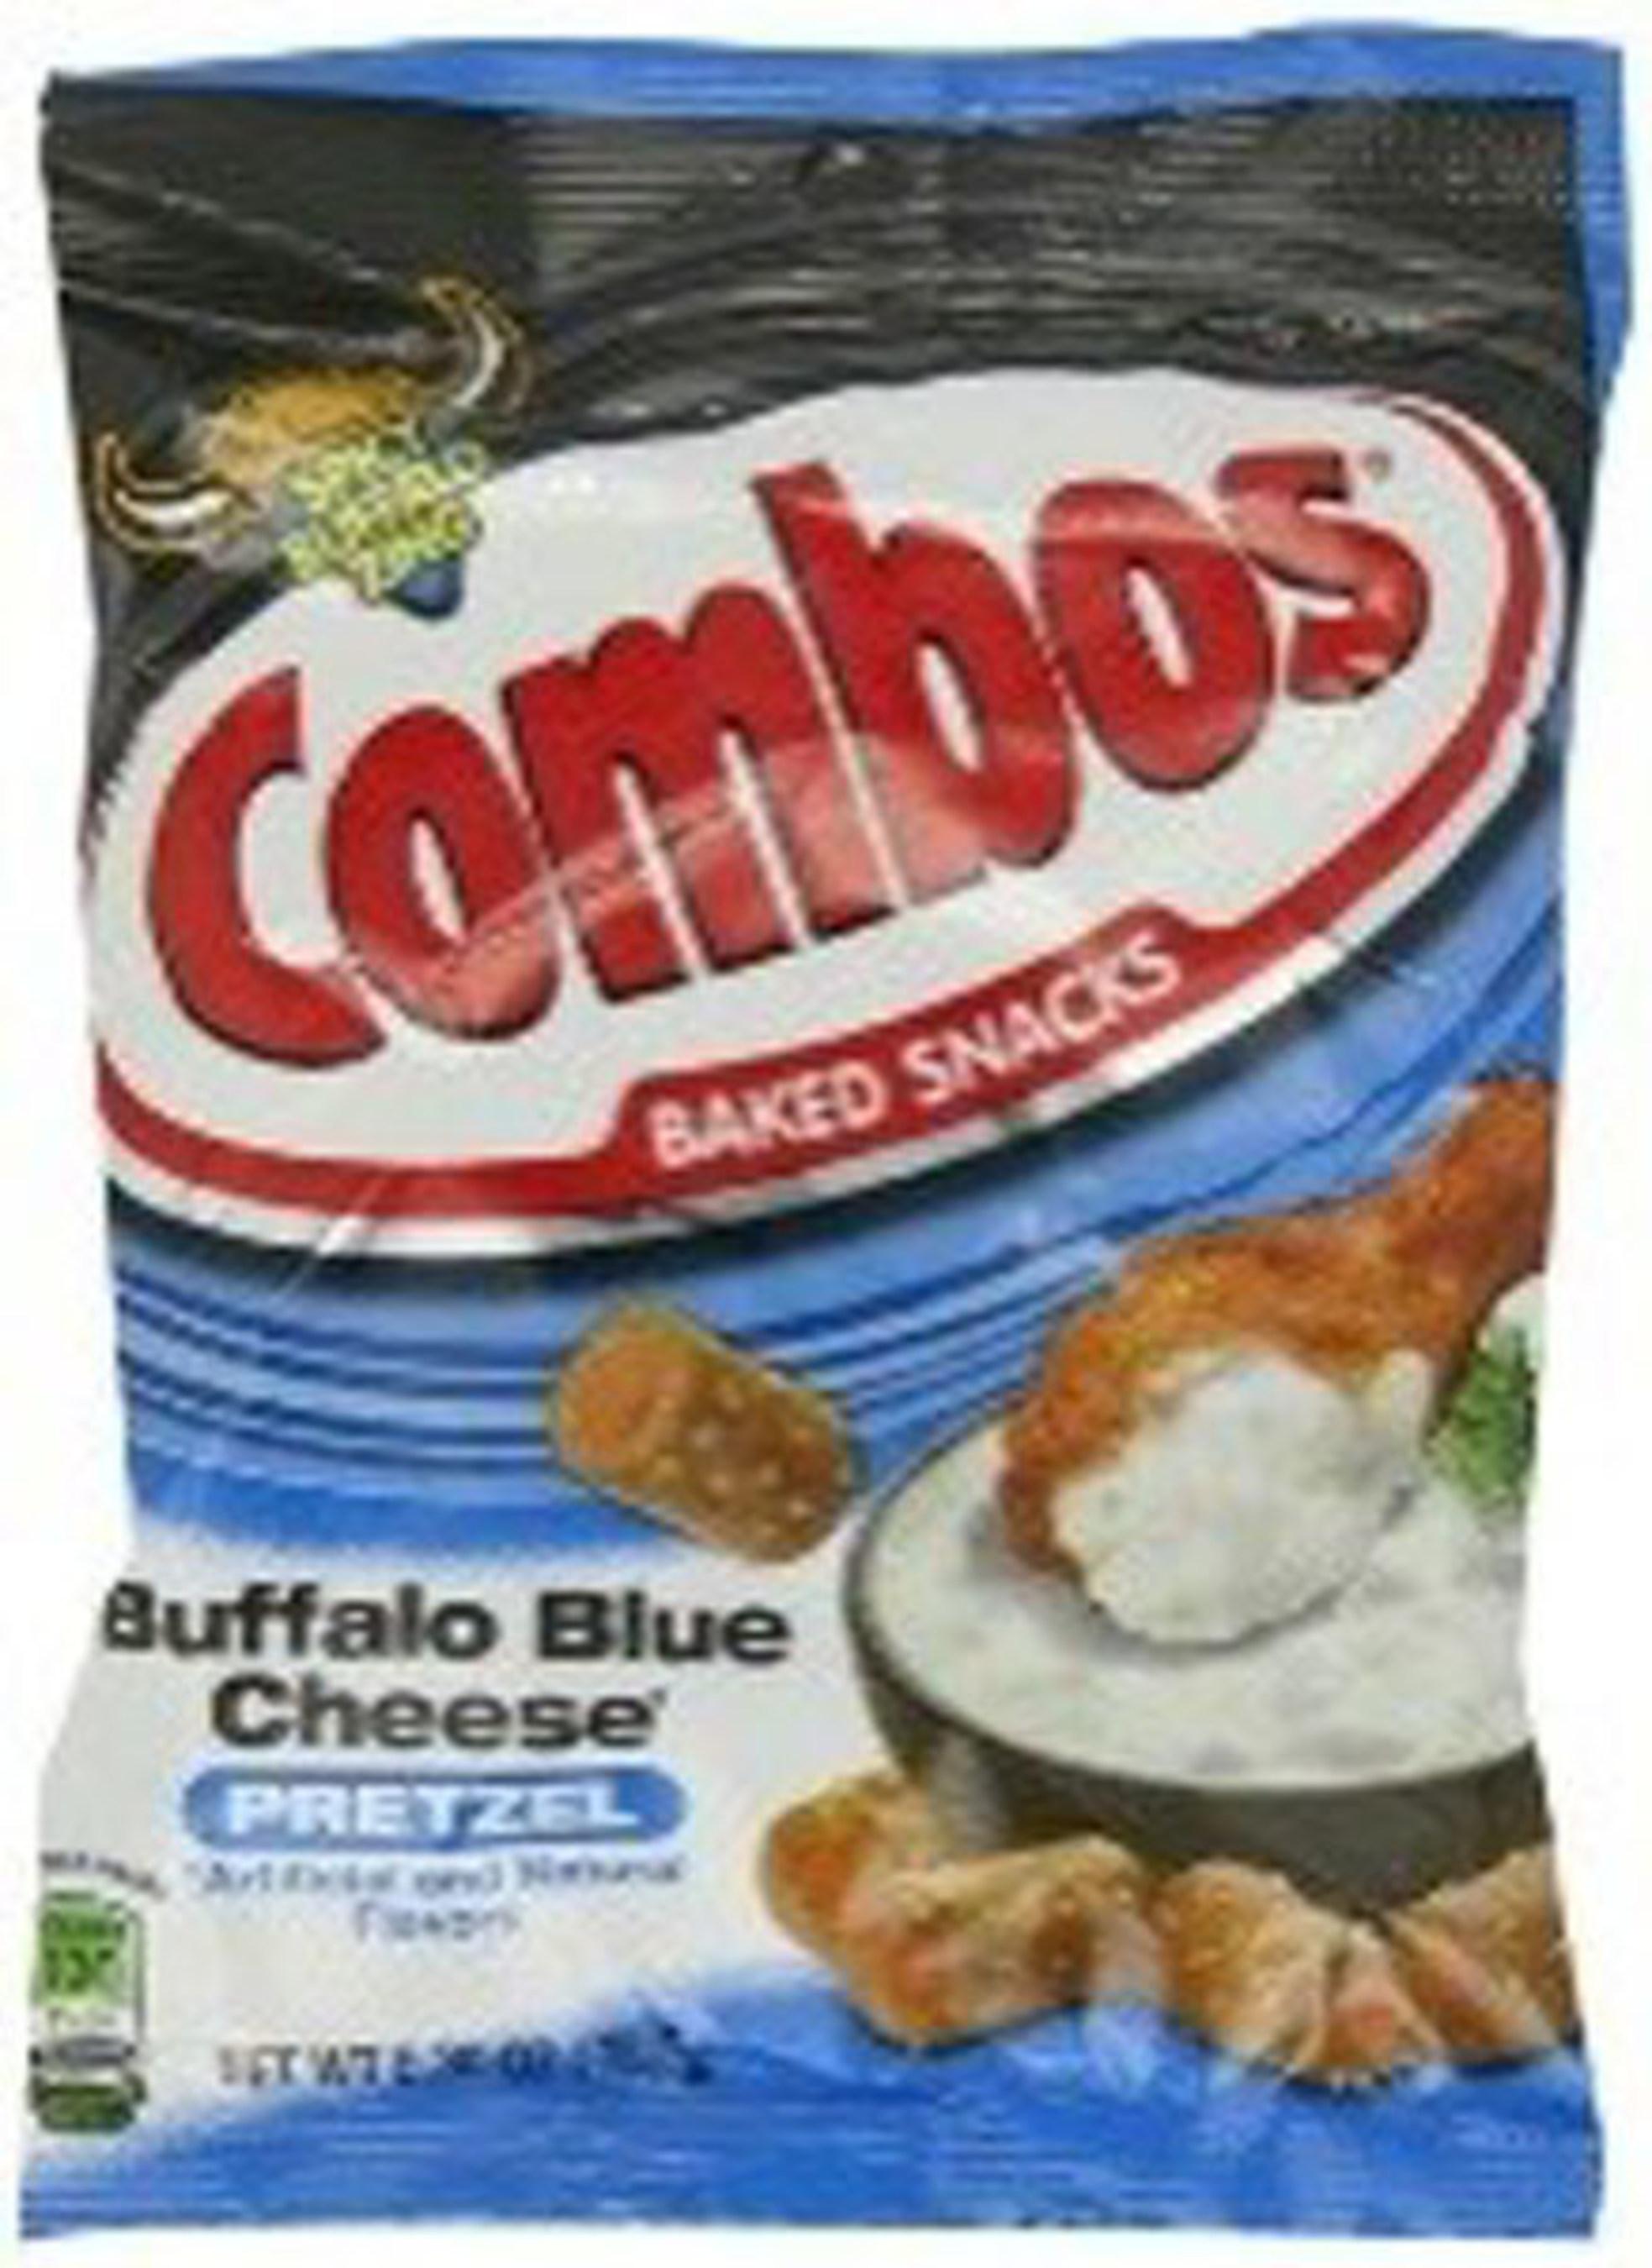 COMBOS BUFFALO BLUE CHEESE PRETZEL - FAMILY PEG PACK - 6.3 OZ - 12/CA